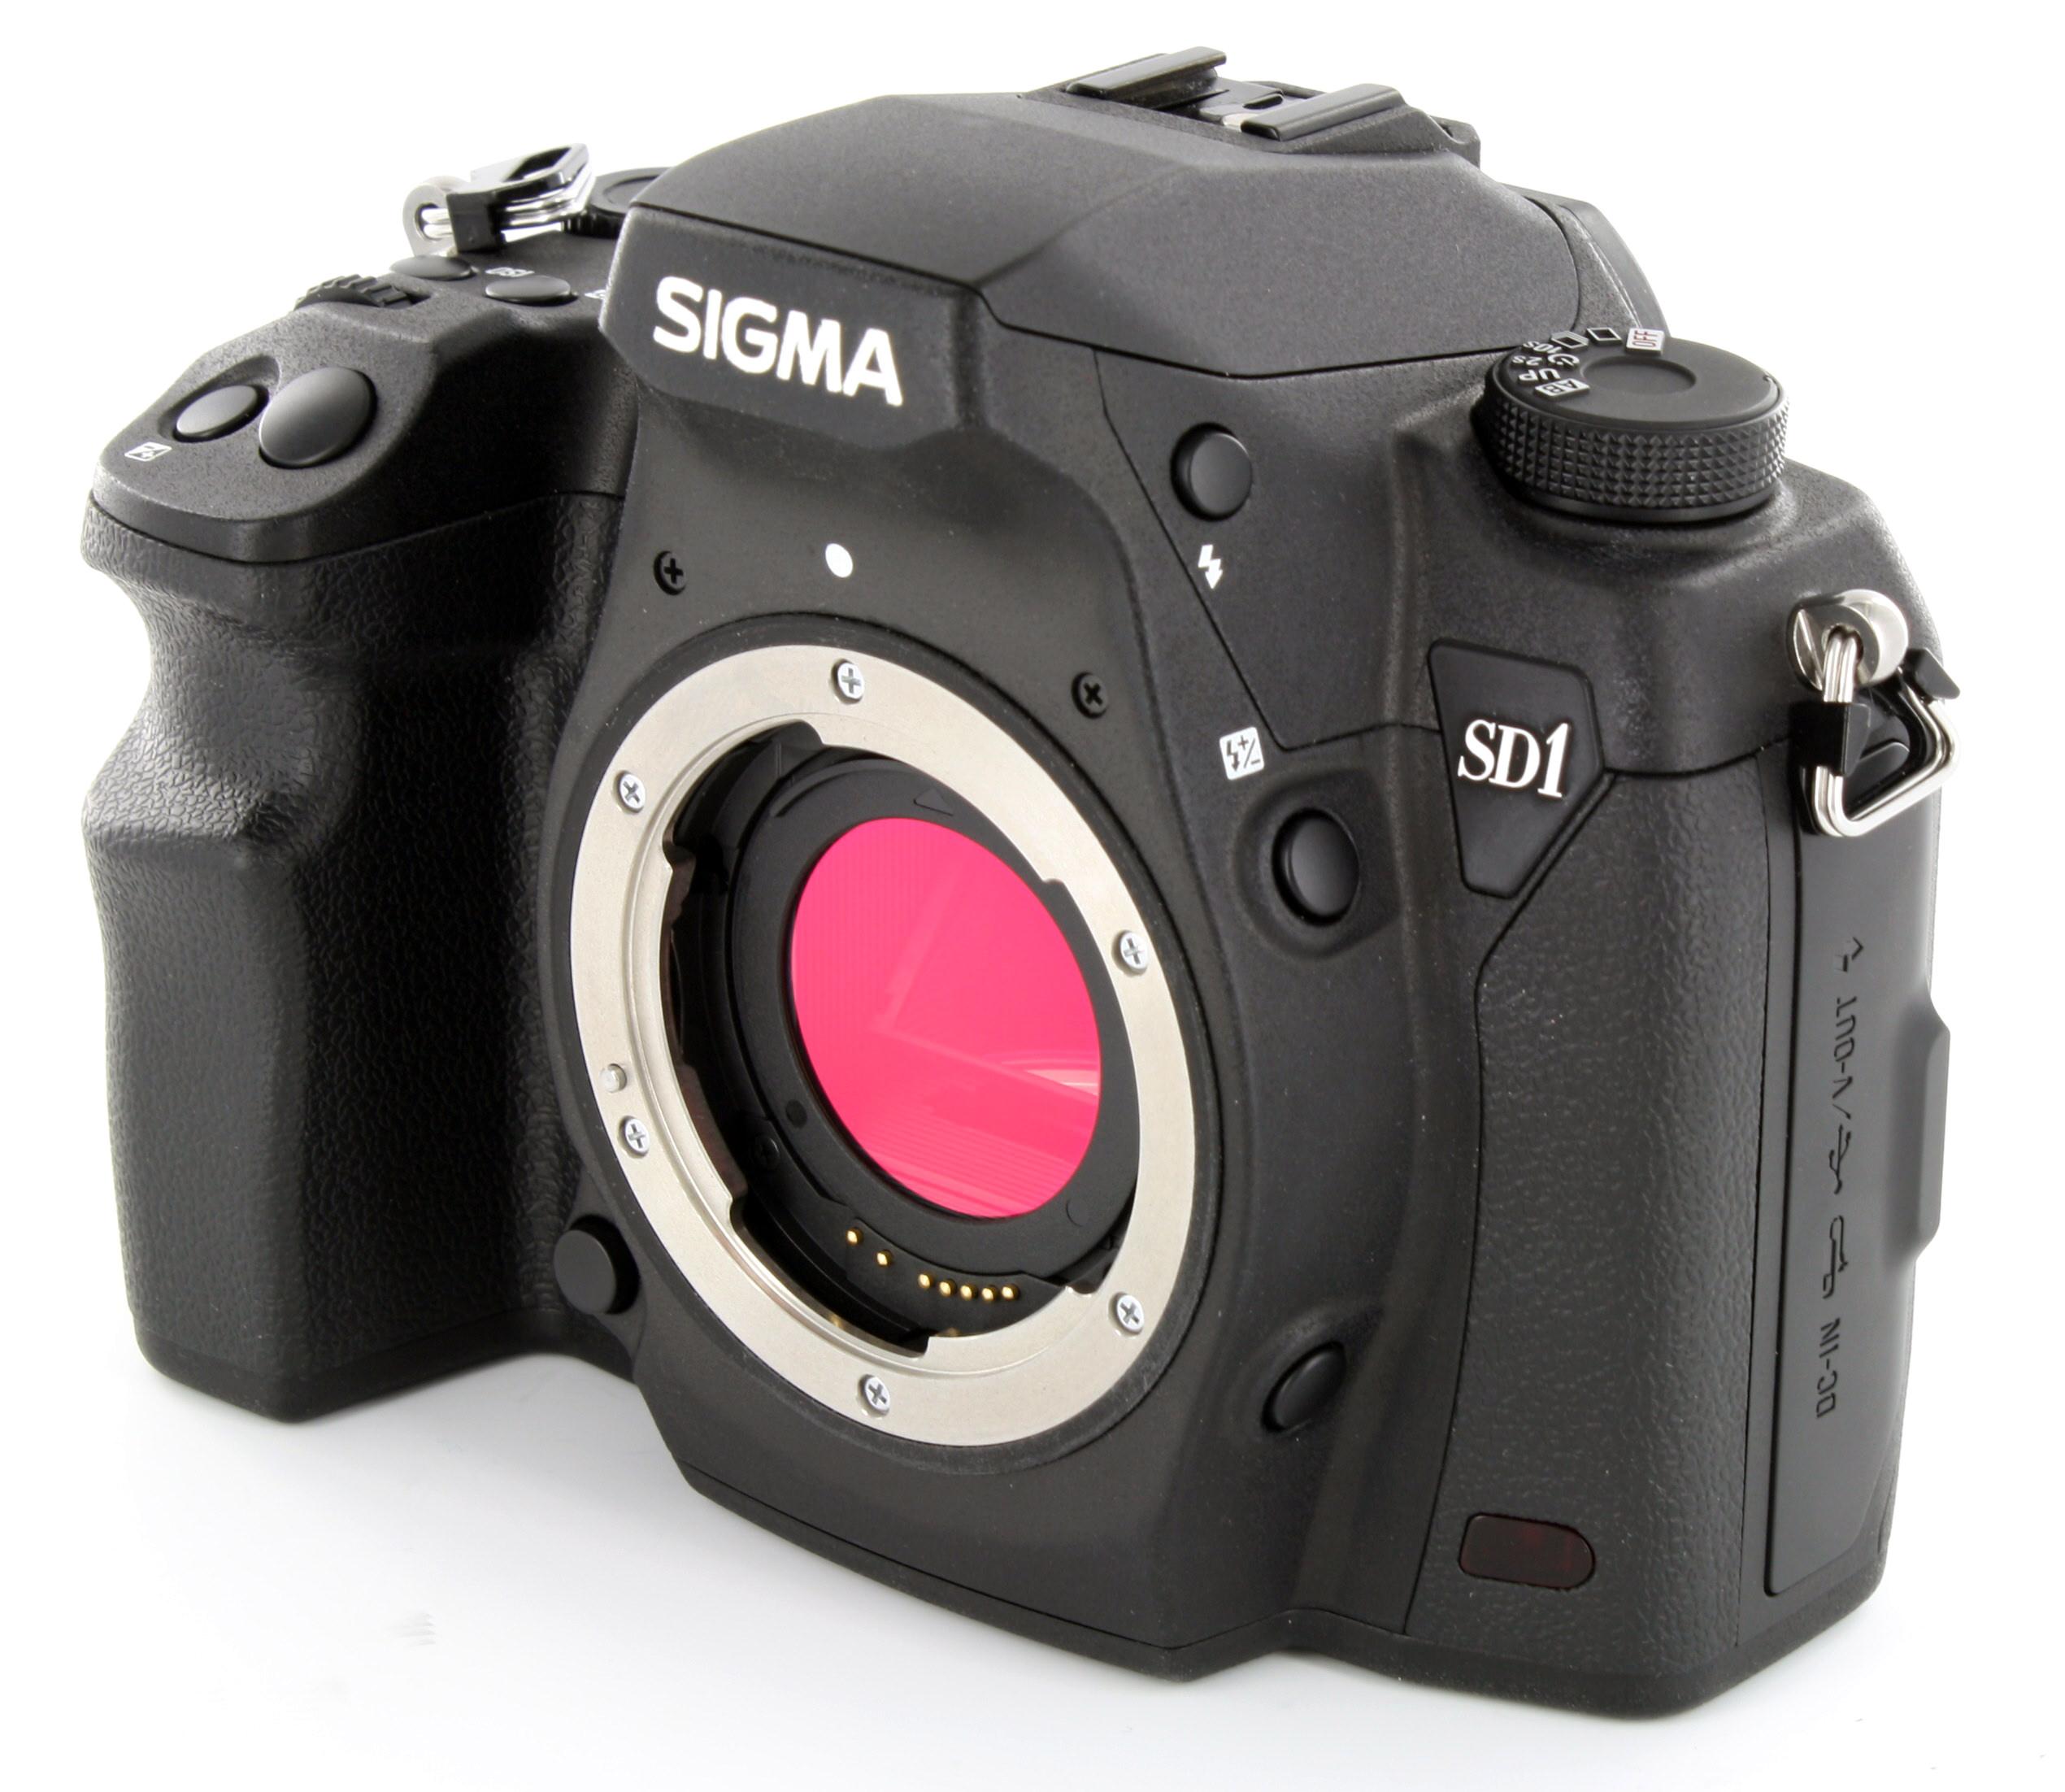 Adorable Sigma Body Sigma Merrill Digital Slr Review Slr Direct Reviews 2016 Slr Direct Reviews 2017 dpreview Slr Direct Reviews